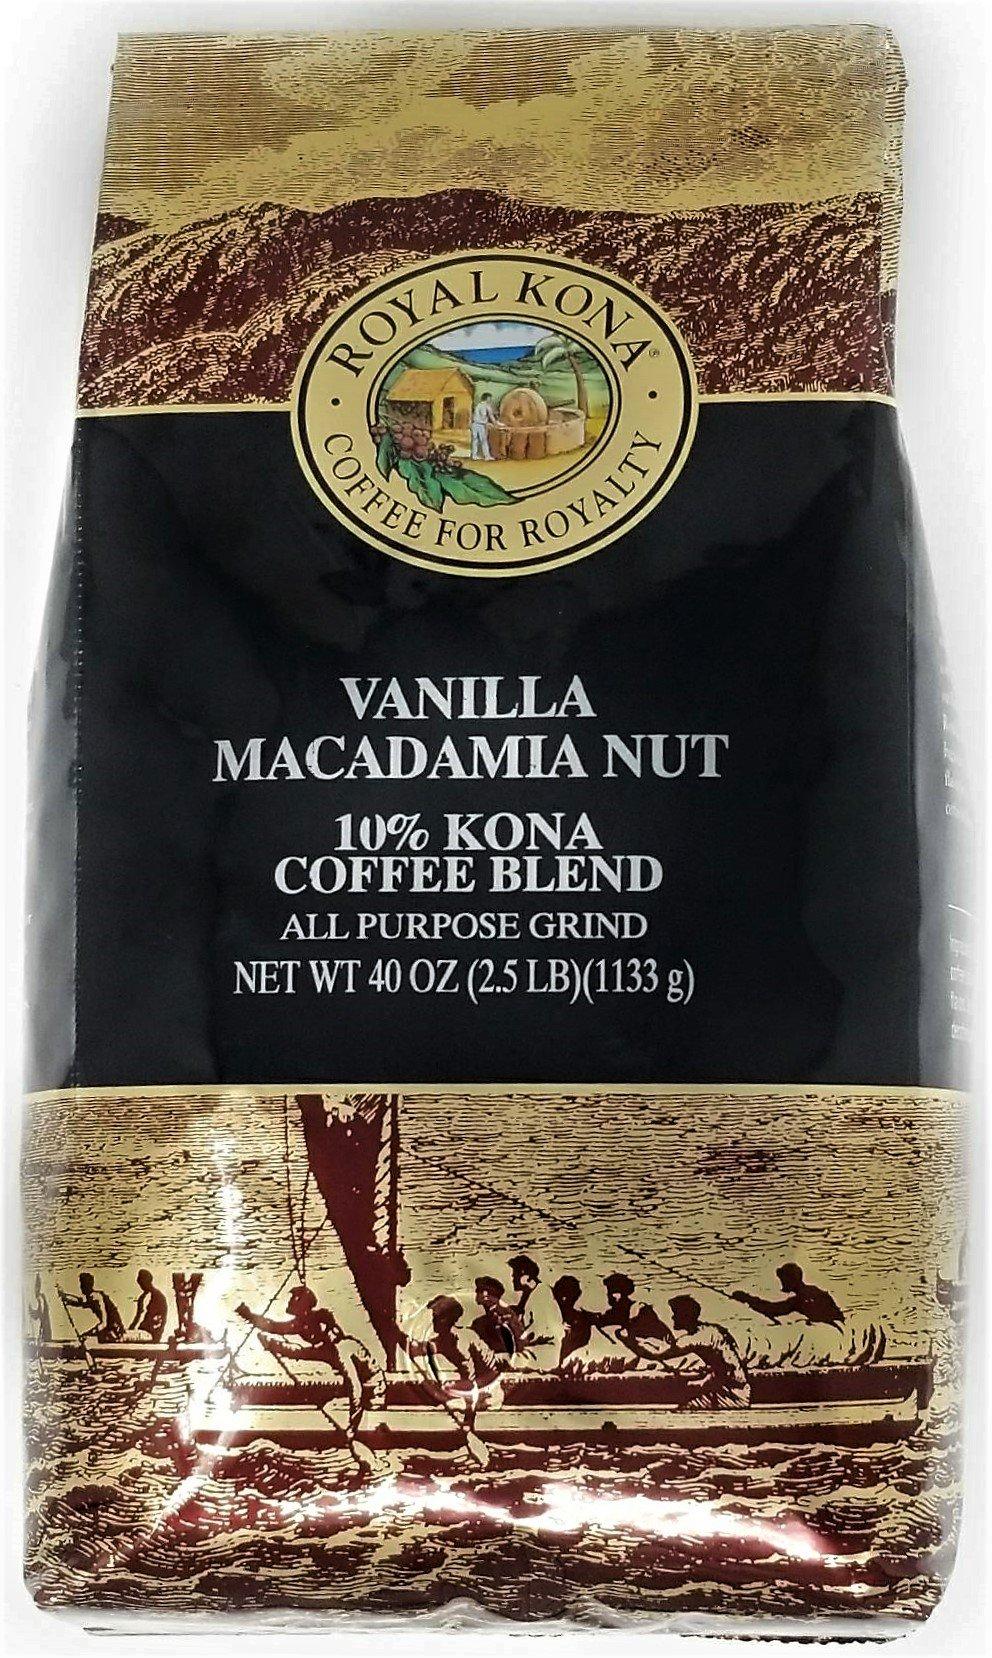 Royal Kona Coffee, Vanilla Macadamia Nut, Ground, 10% Kona Coffee Blend (40 Oz./2.5 Pound Bag) Roasted to Perfection in Hawaii by ROYAL KONA COFFEE FOR ROYALTY